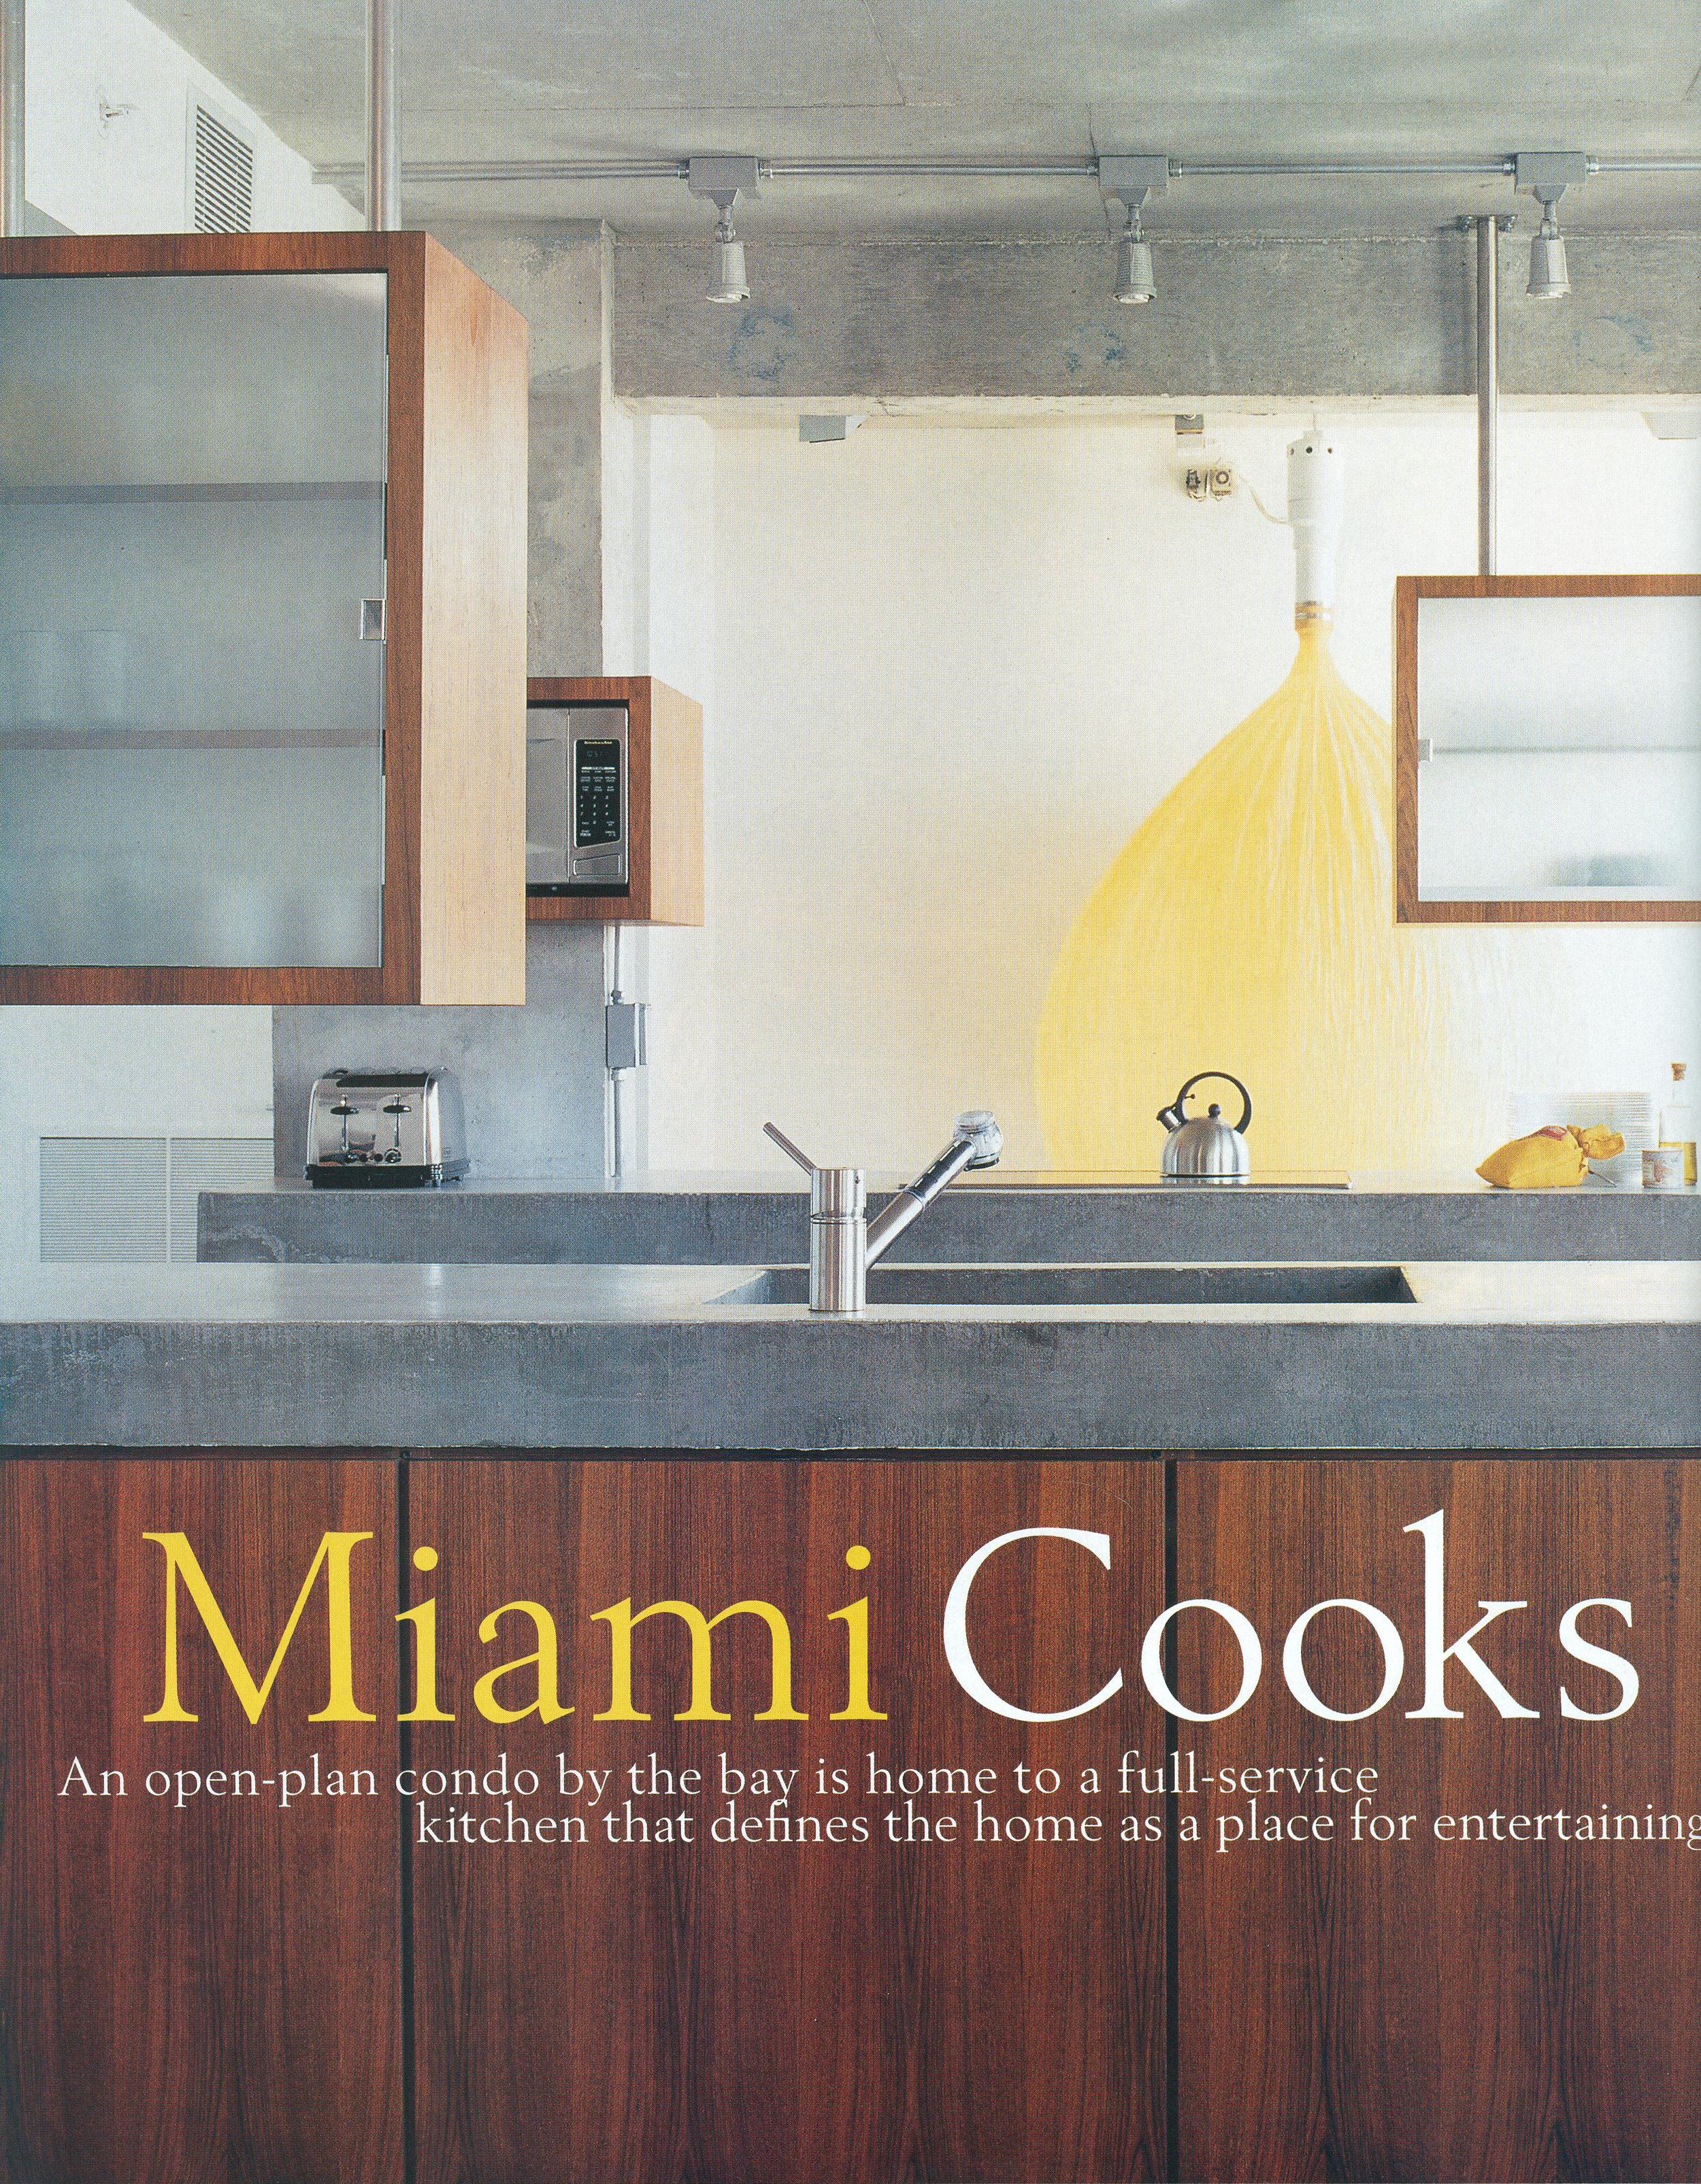 Met Home_Miami Cooks_01.jpg